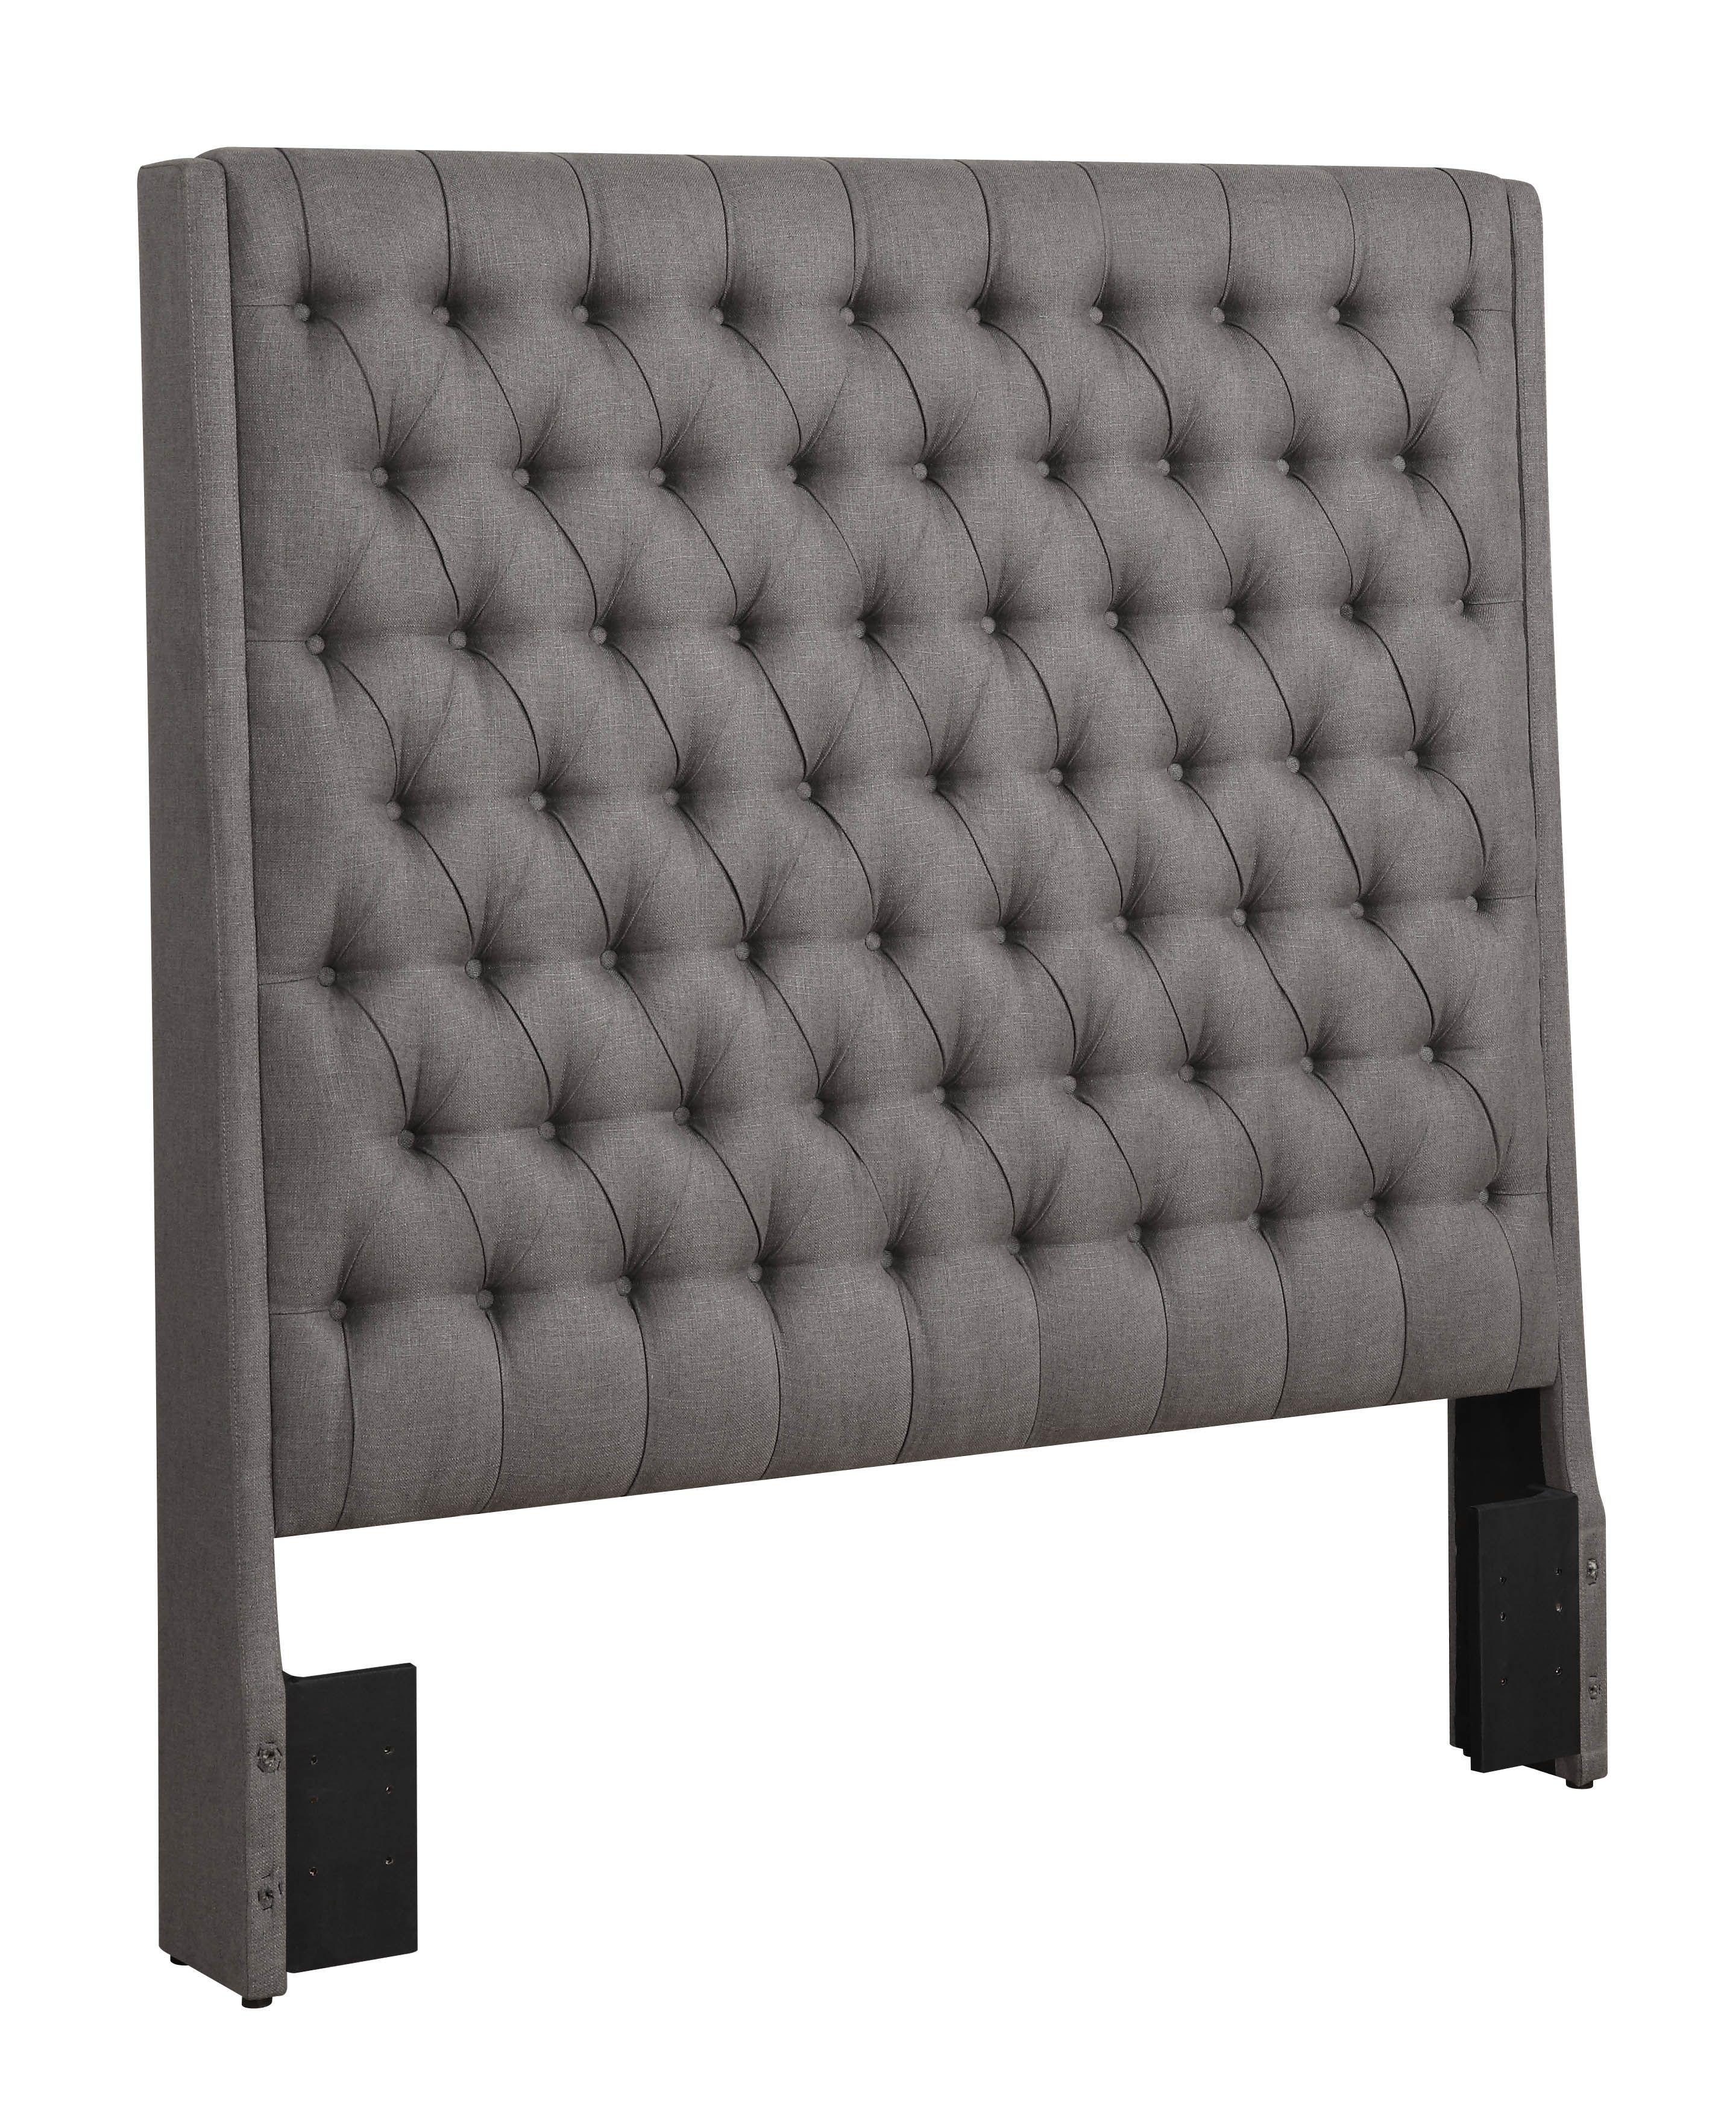 Queen Modern Ultra Tall Headboard in Tufted Grey Fabric